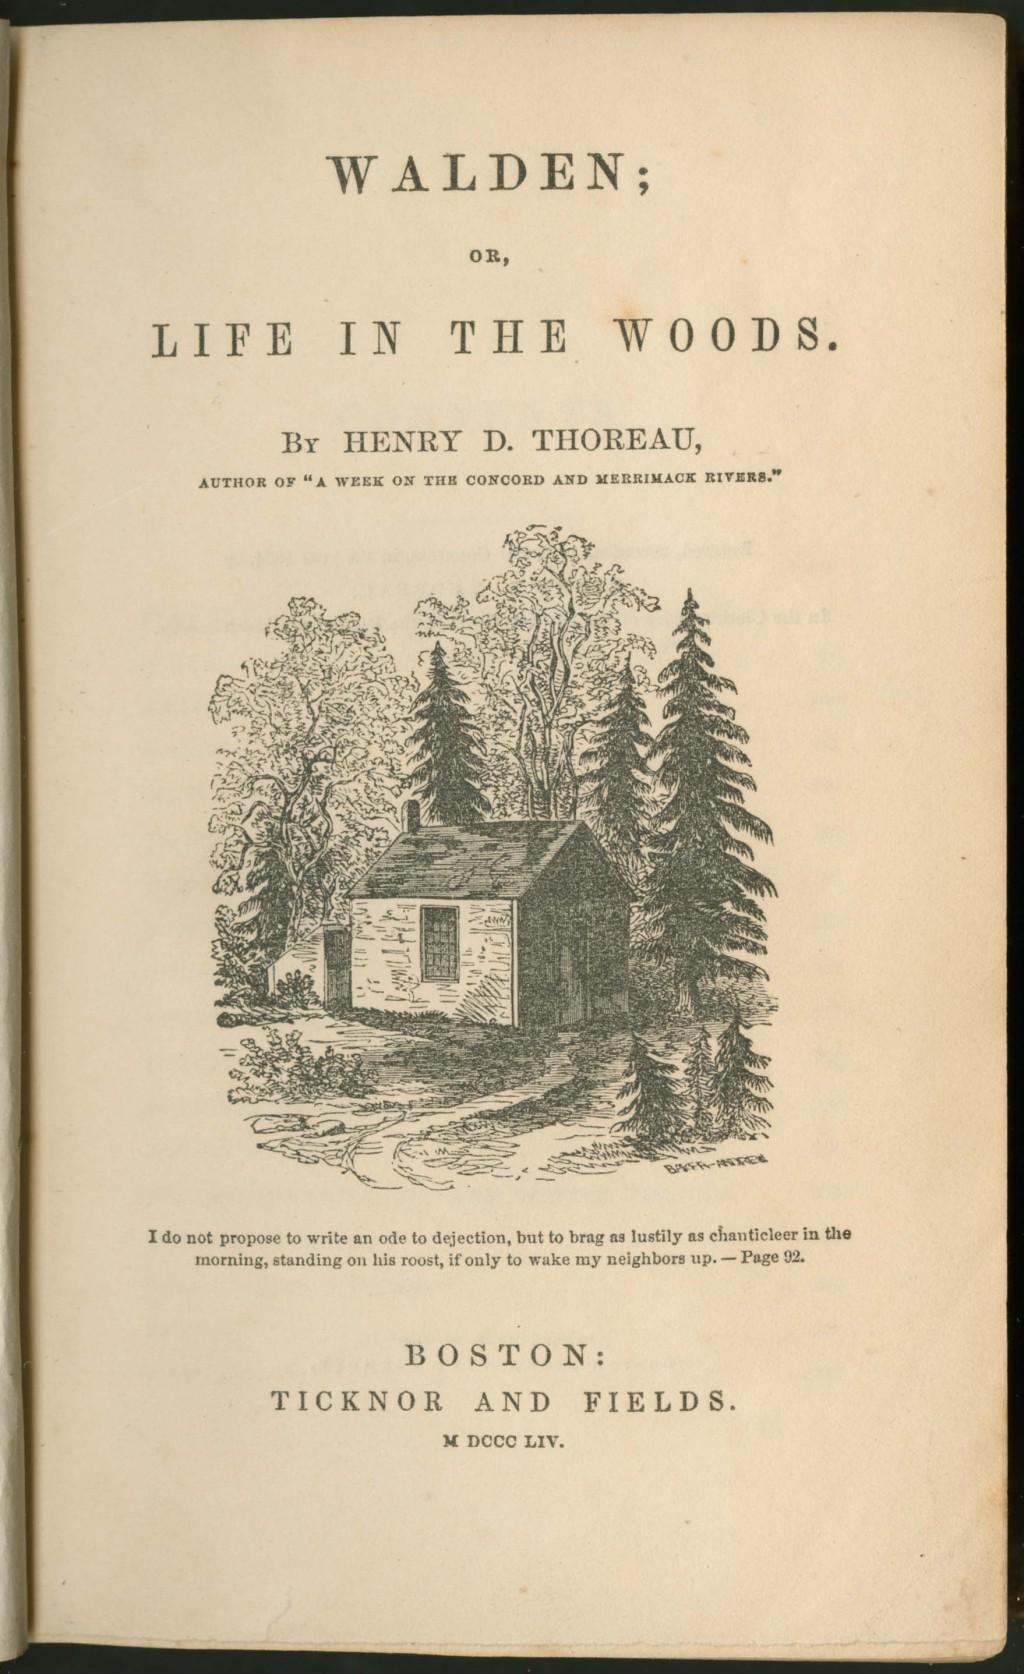 014 818 31 W14 1854 Tp Emerson Essays Essay Dreaded Ralph Pdf First Series Summary Waldo Nature Large